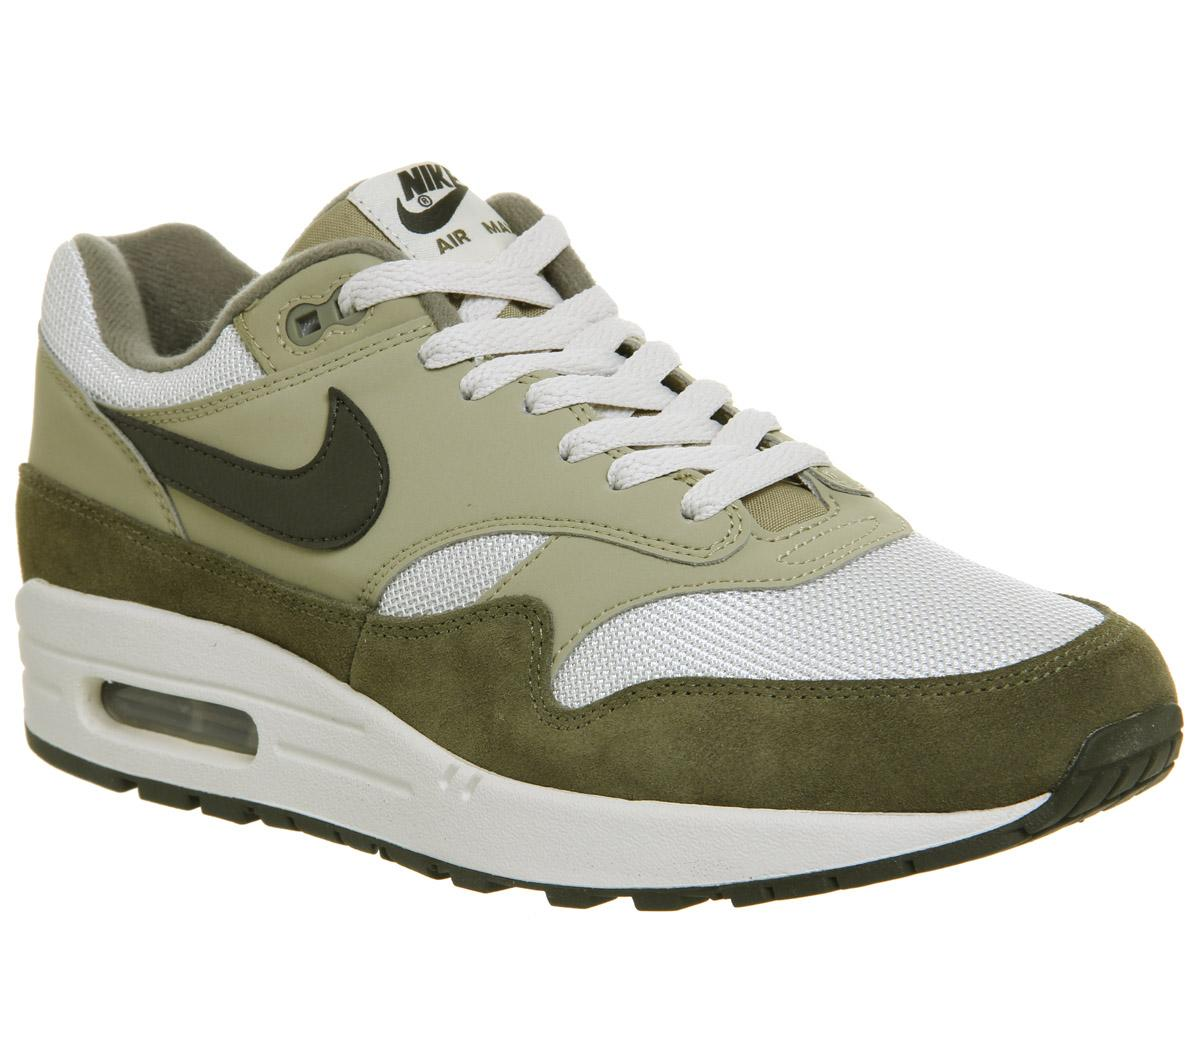 Nike Air Max 1 (Medium Olive Sequoia Neutral Olive)